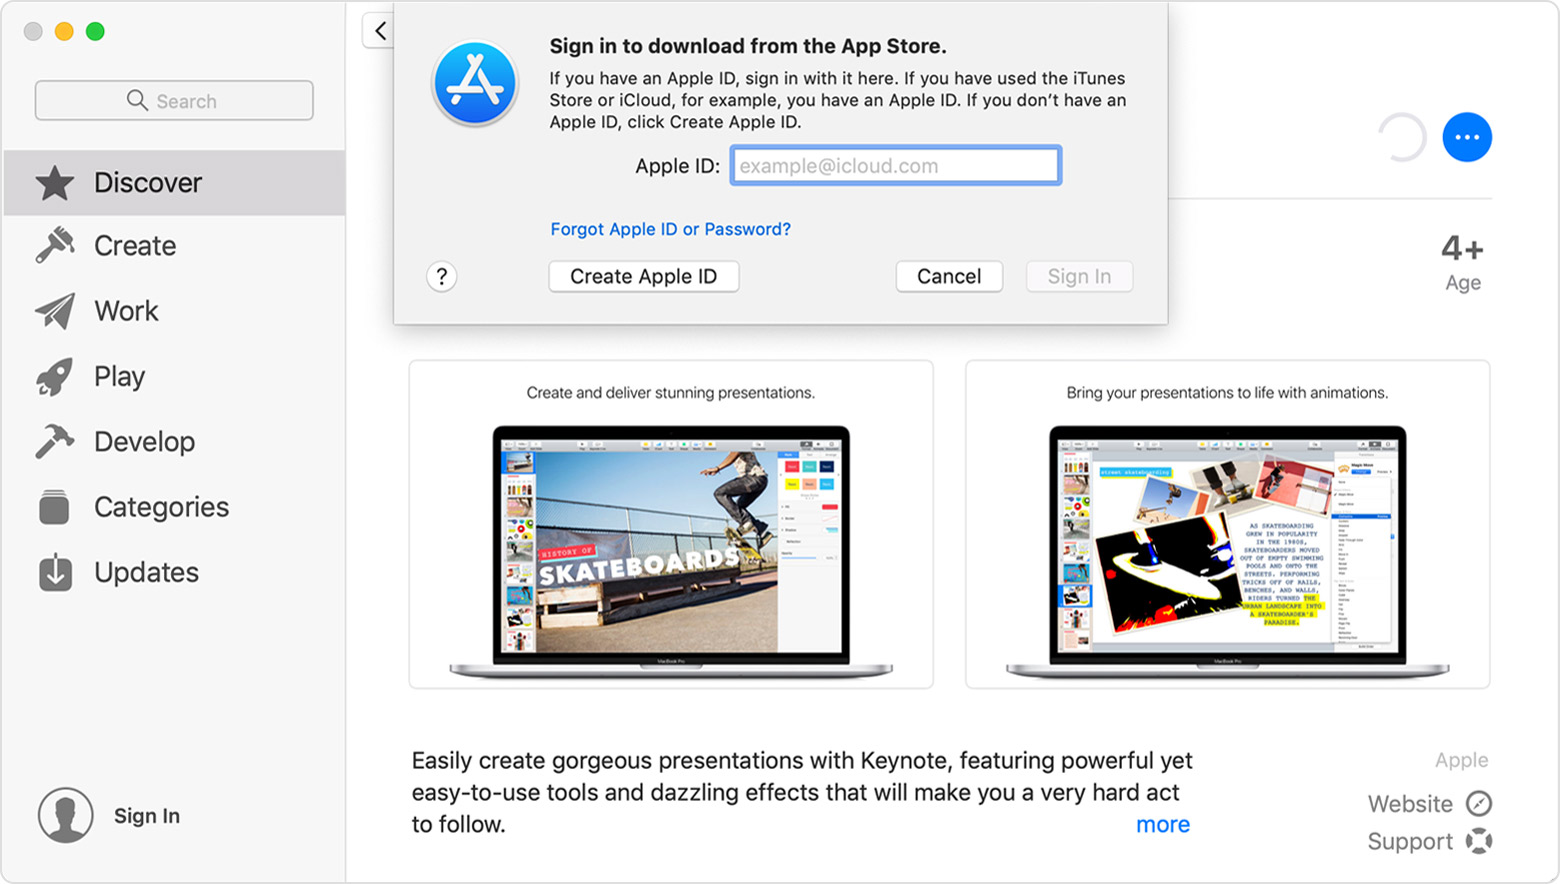 https://asset.droidyue.com/image/2019_02/macos-mojave-app-store-free-app-create-apple-id.jpg